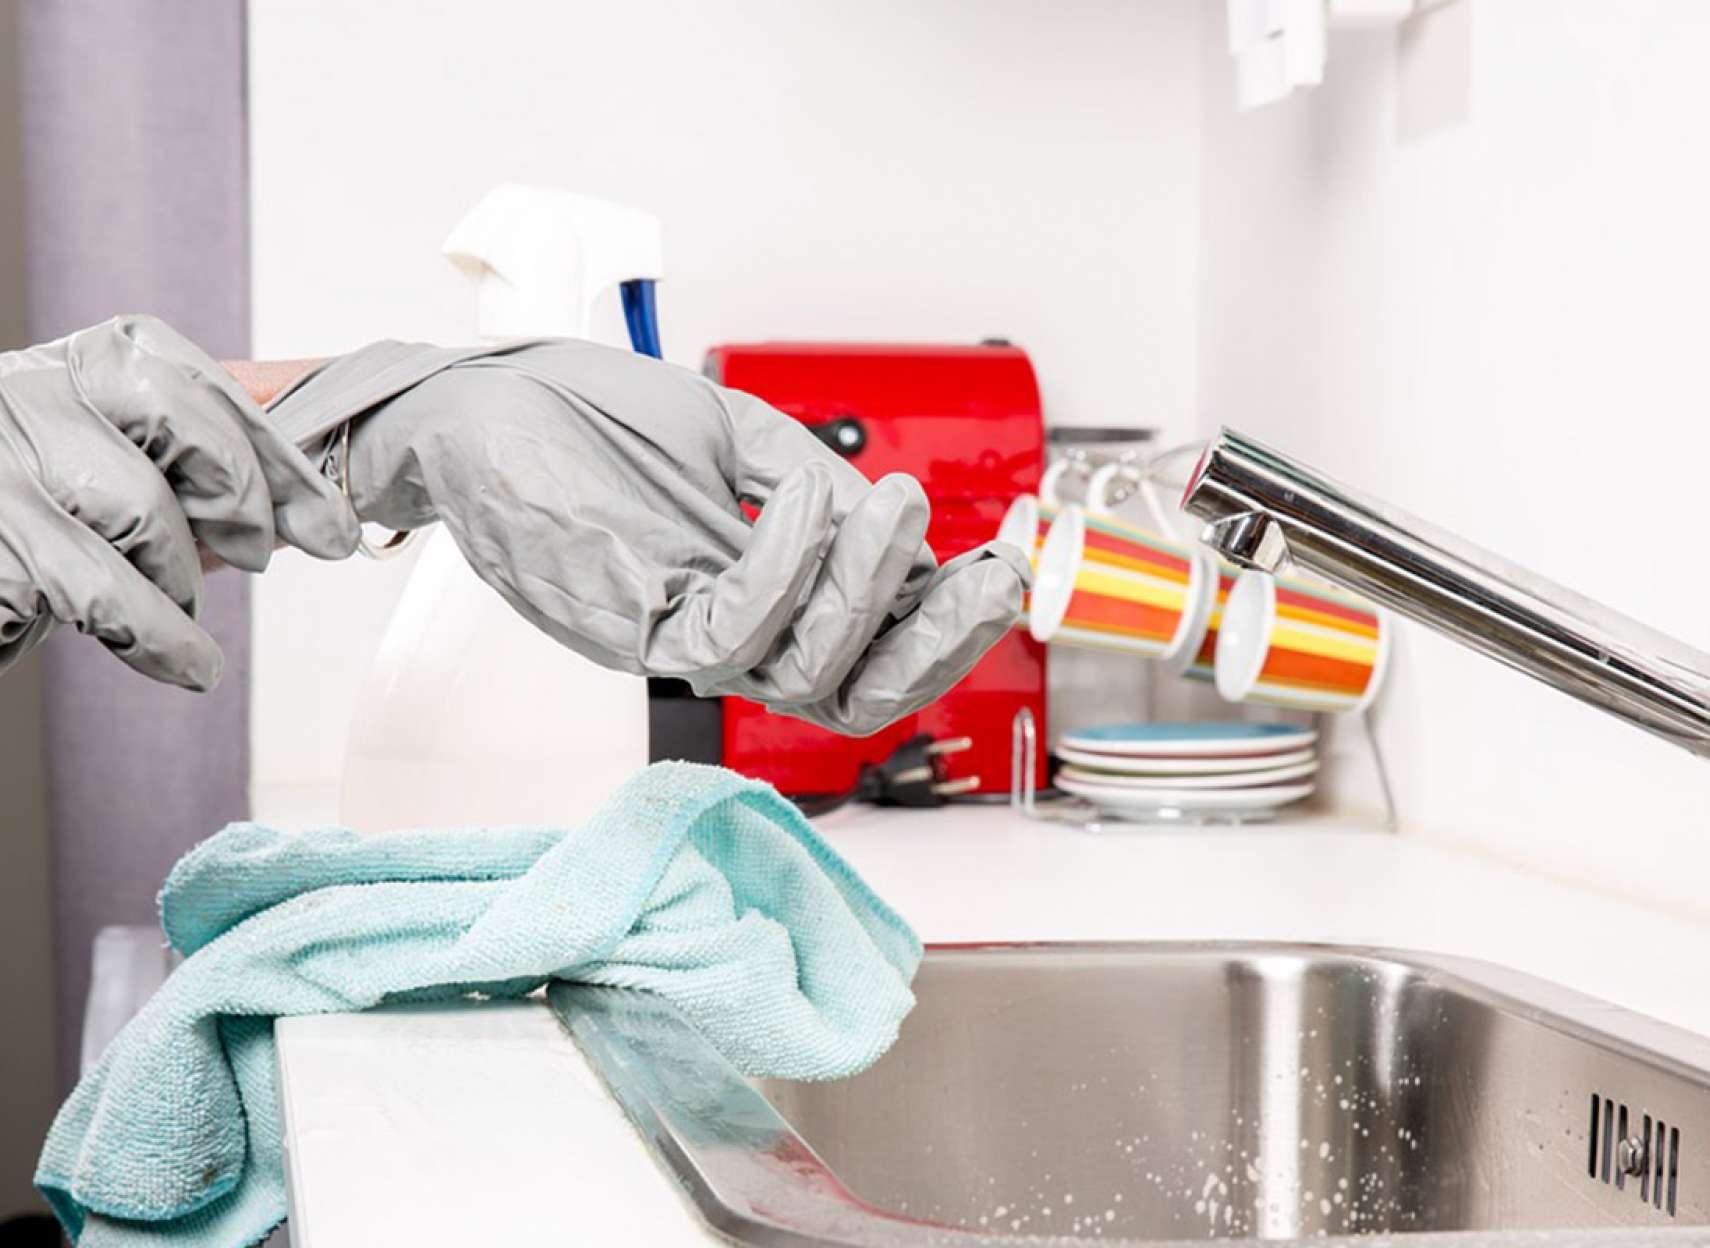 health-medical-home-clean